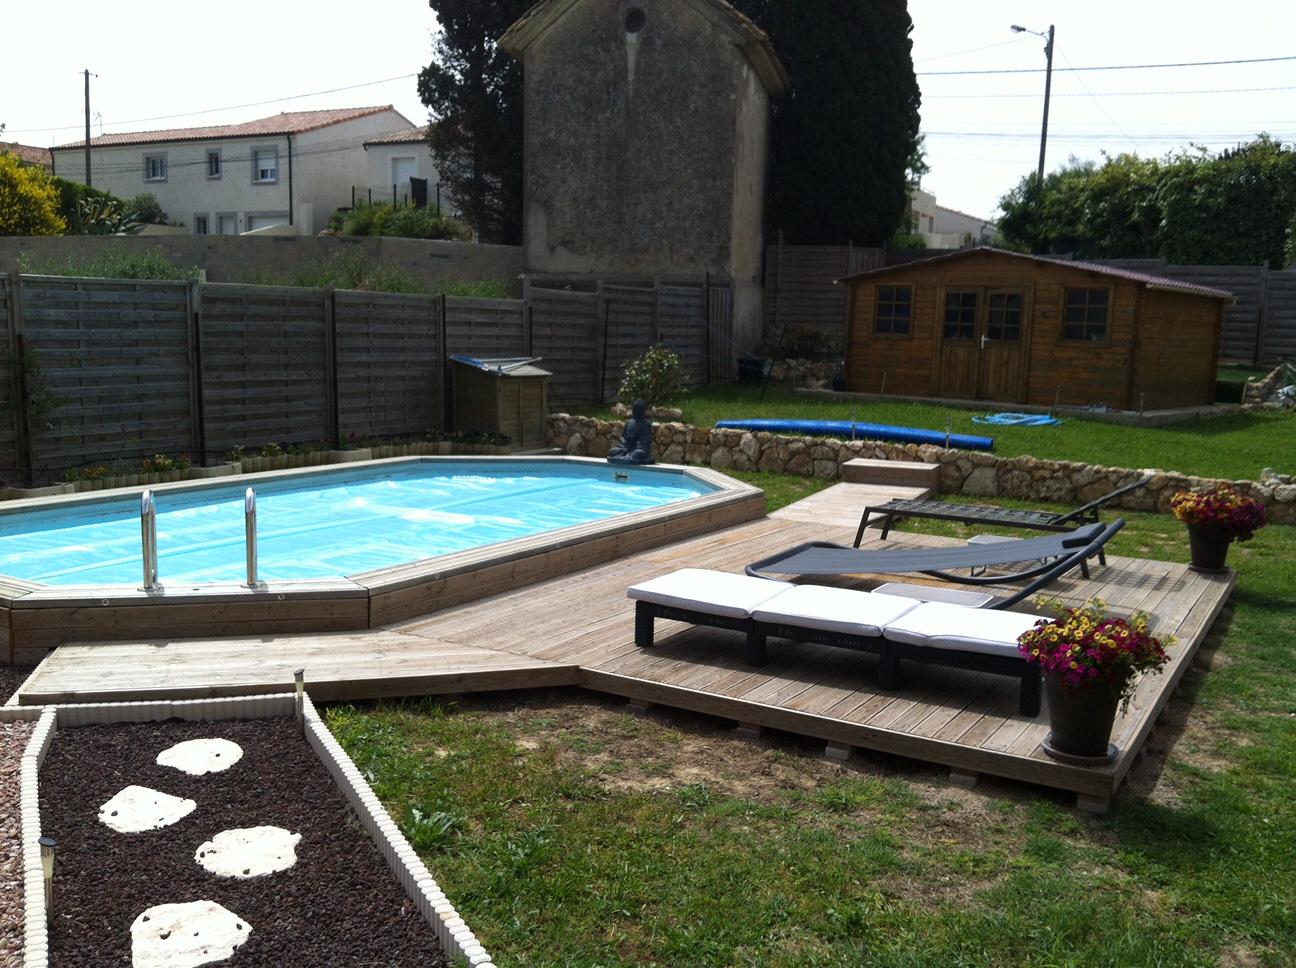 Piscine - Amenagement exterieur piscine jardin ...